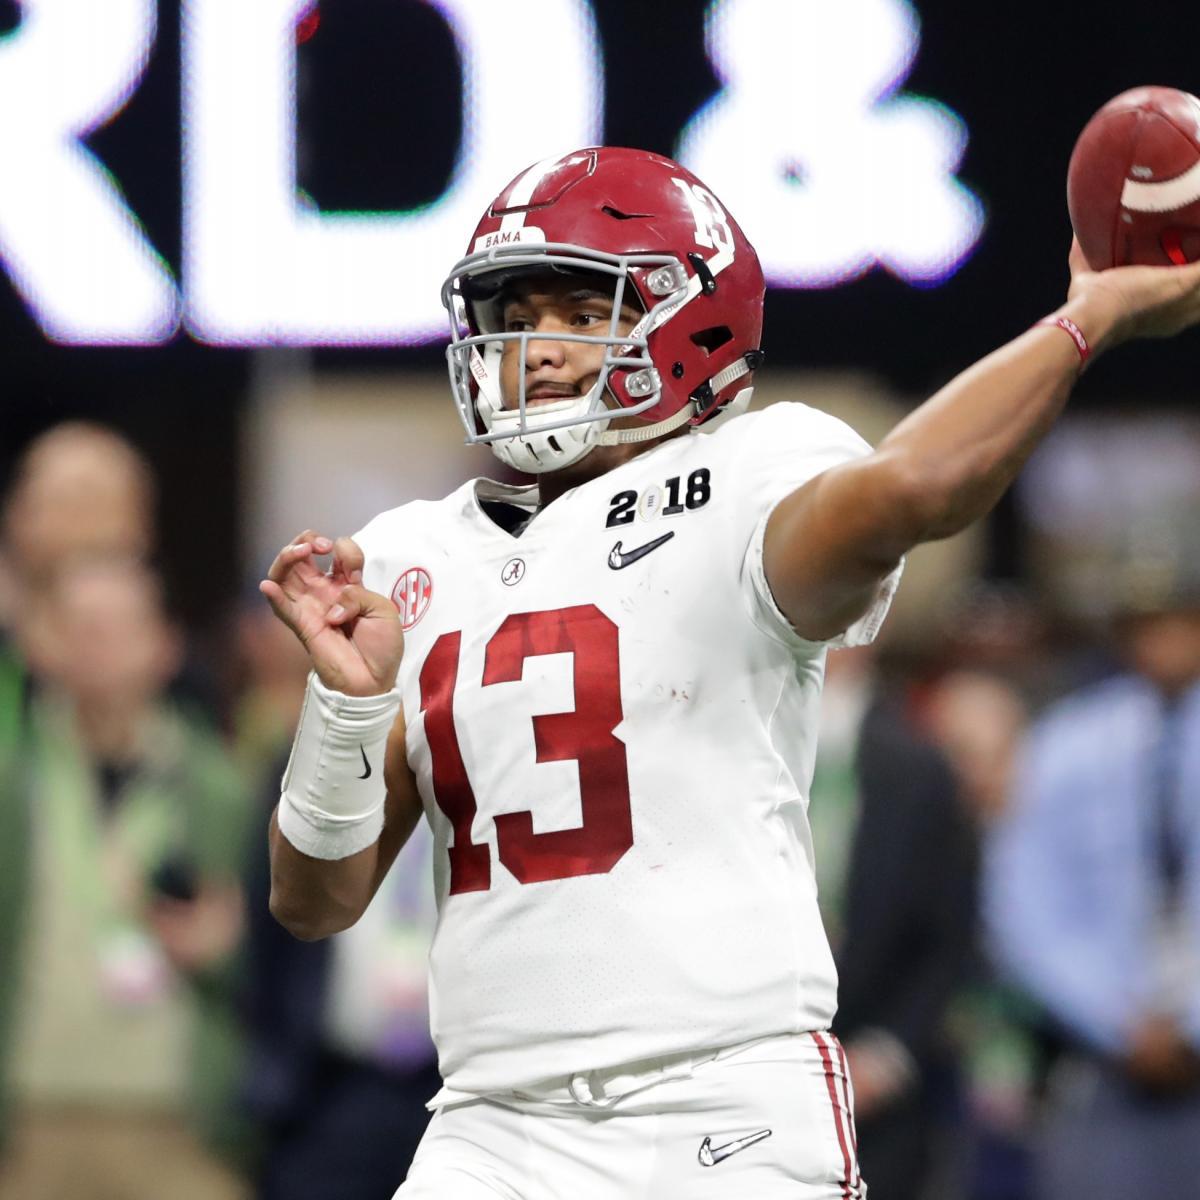 College Football Rankings: Early Look At 2018 Preseason